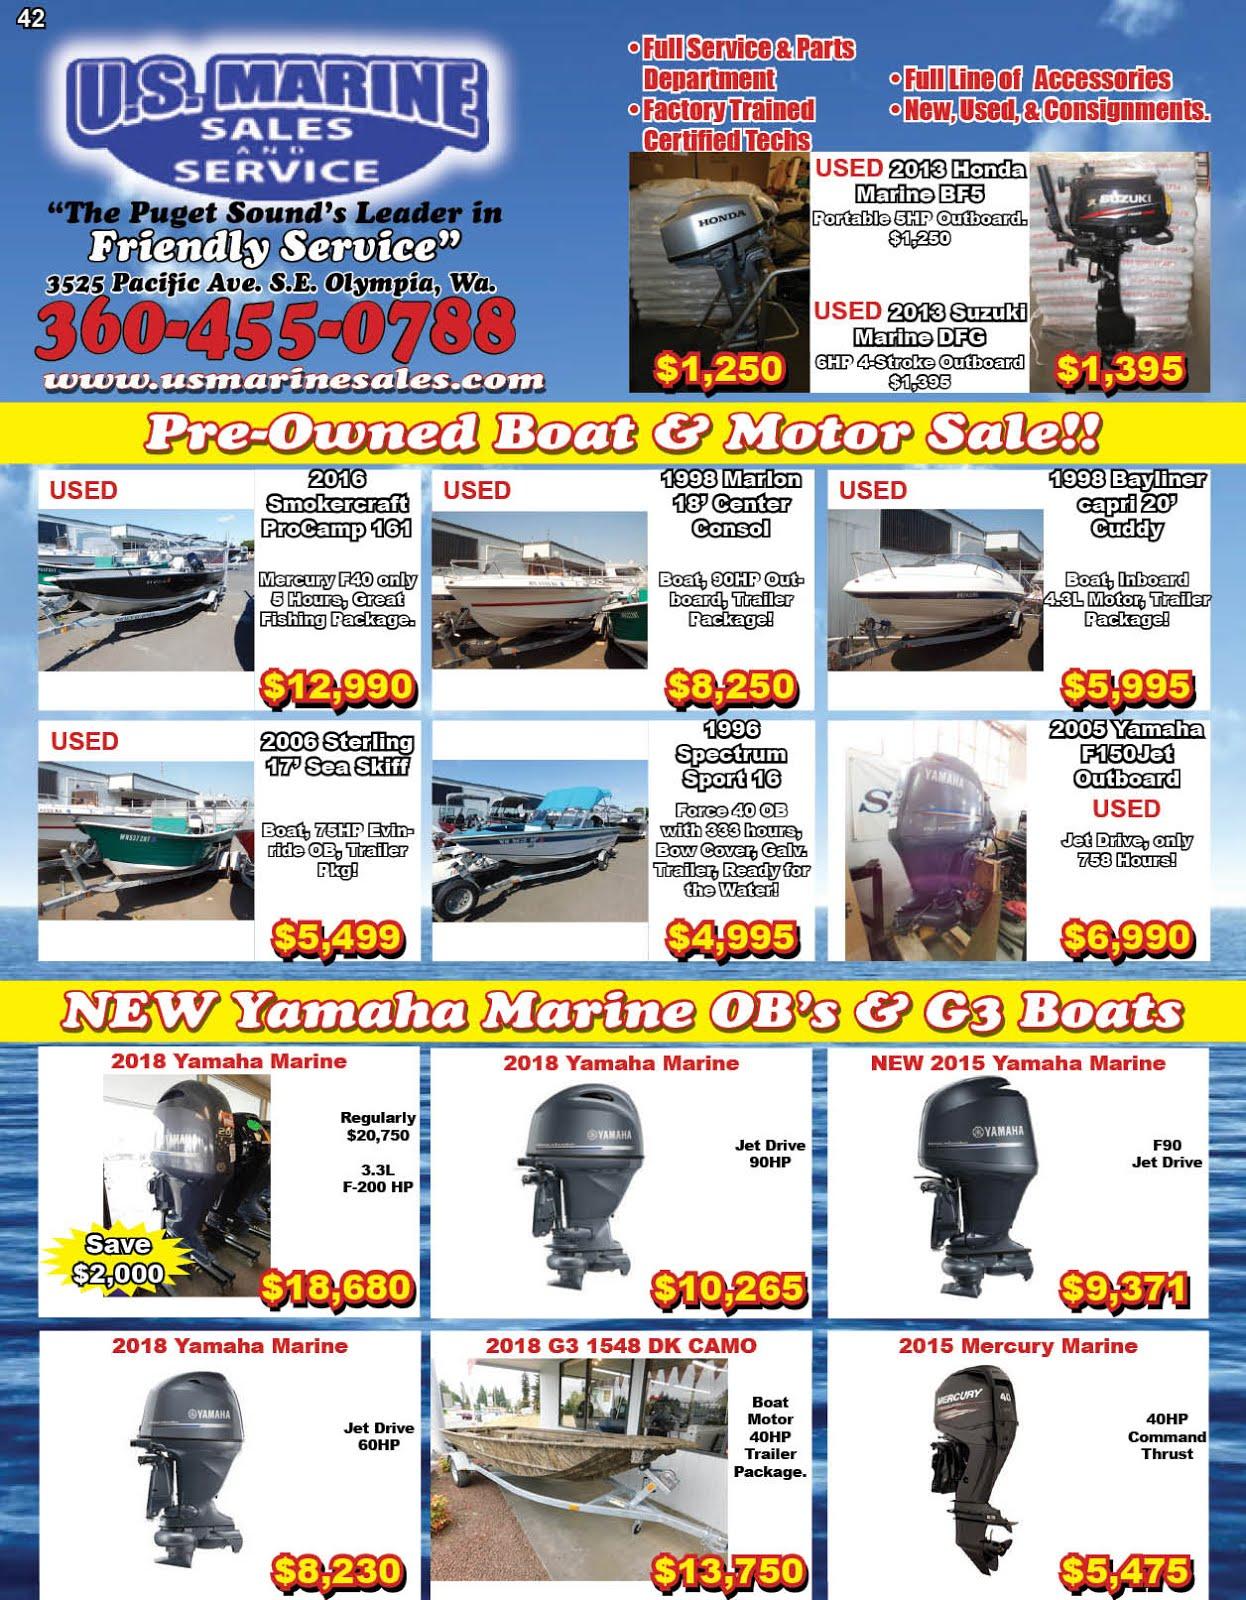 US Marine Sales & Service